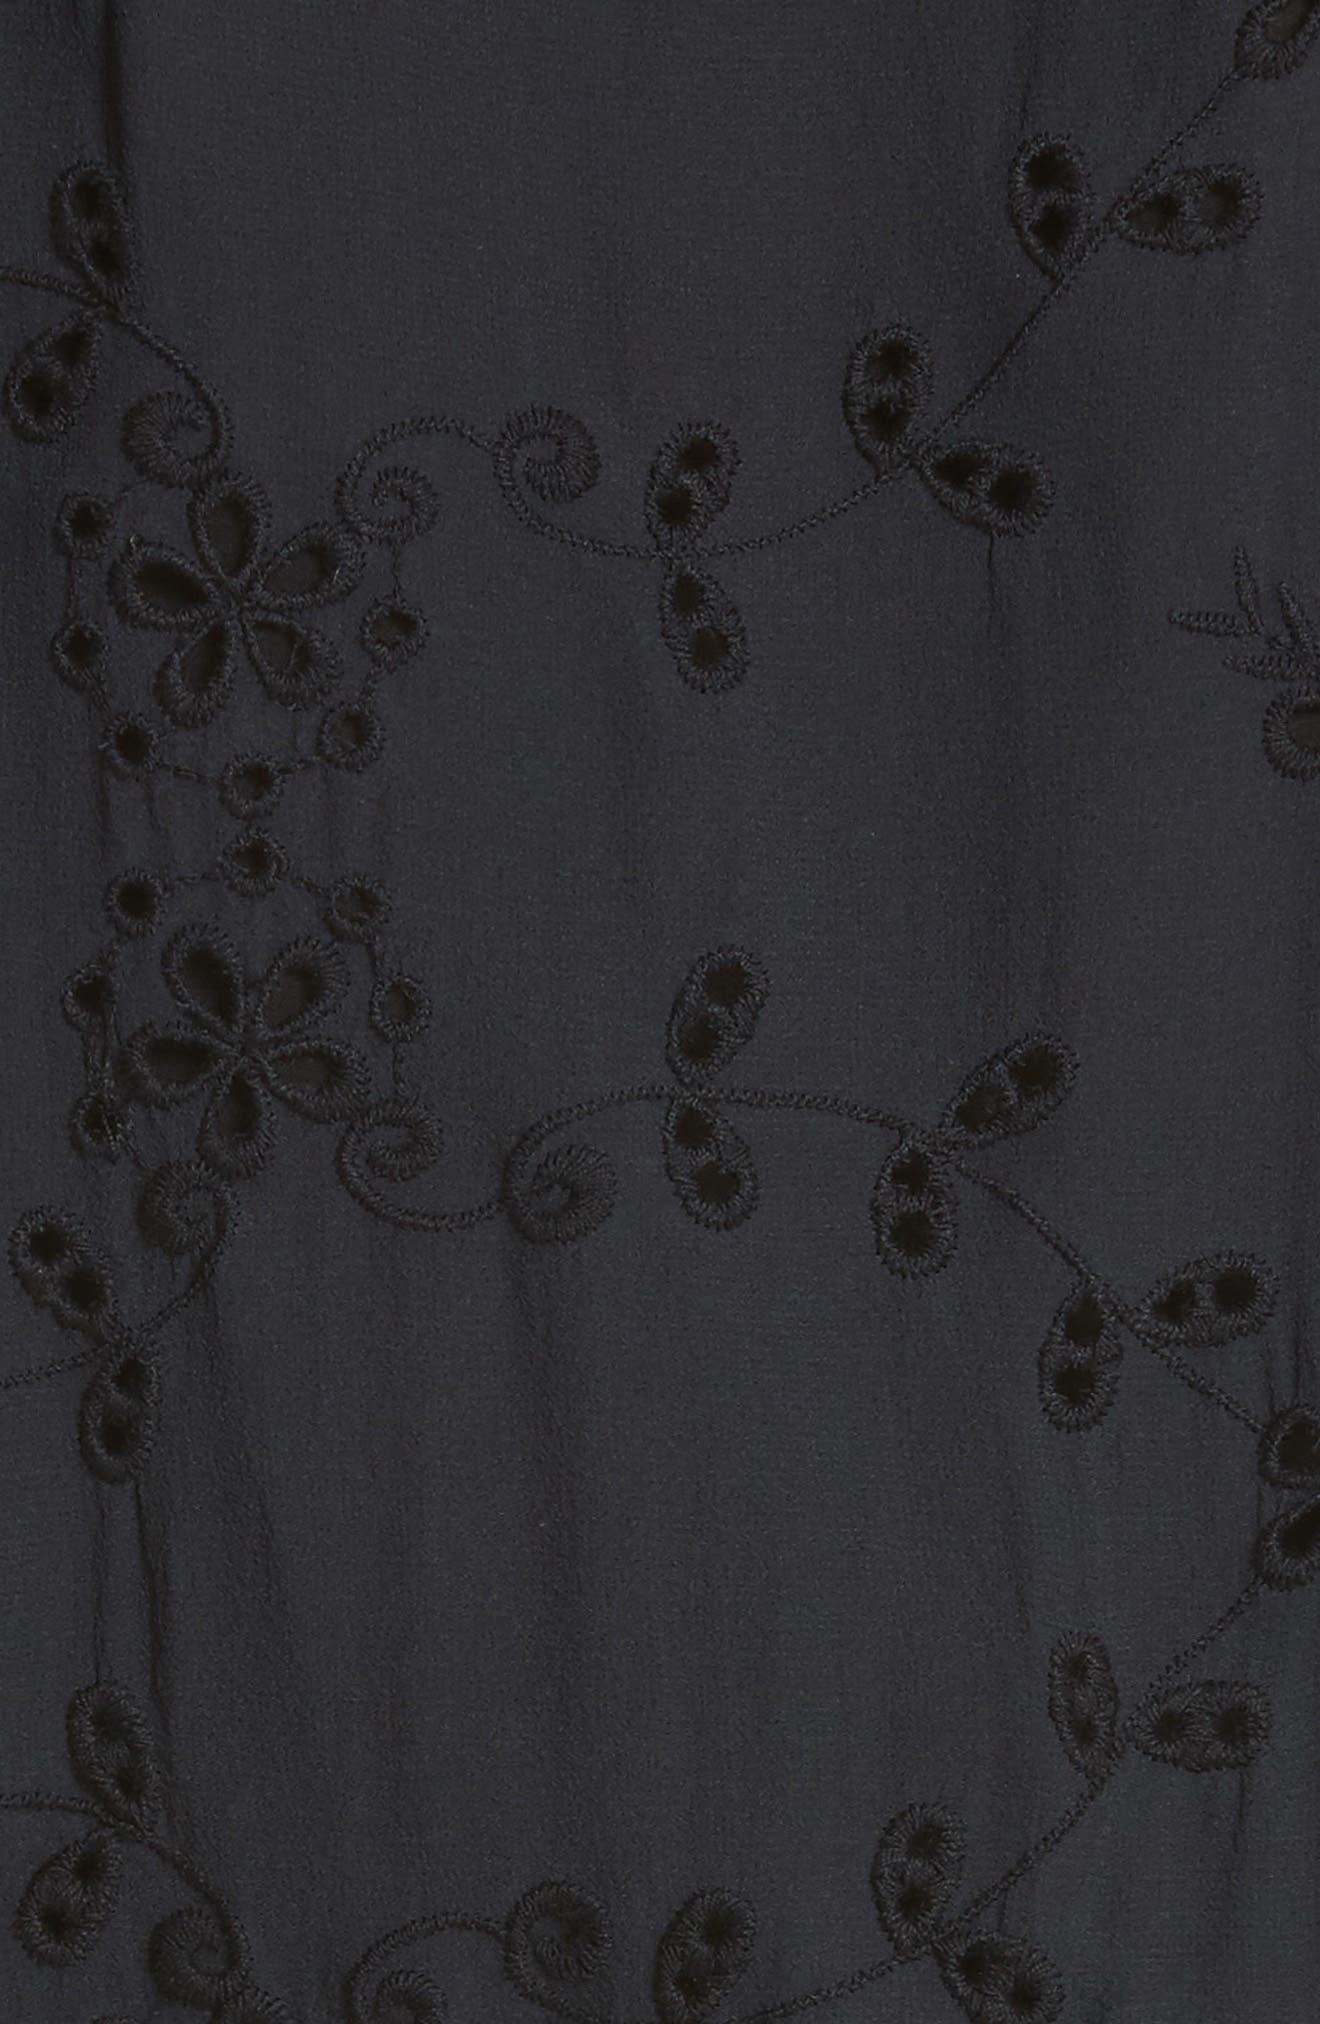 Alpheus Cold Shoulder Ruffled Silk Dress,                             Alternate thumbnail 5, color,                             Caviar/ Caviar